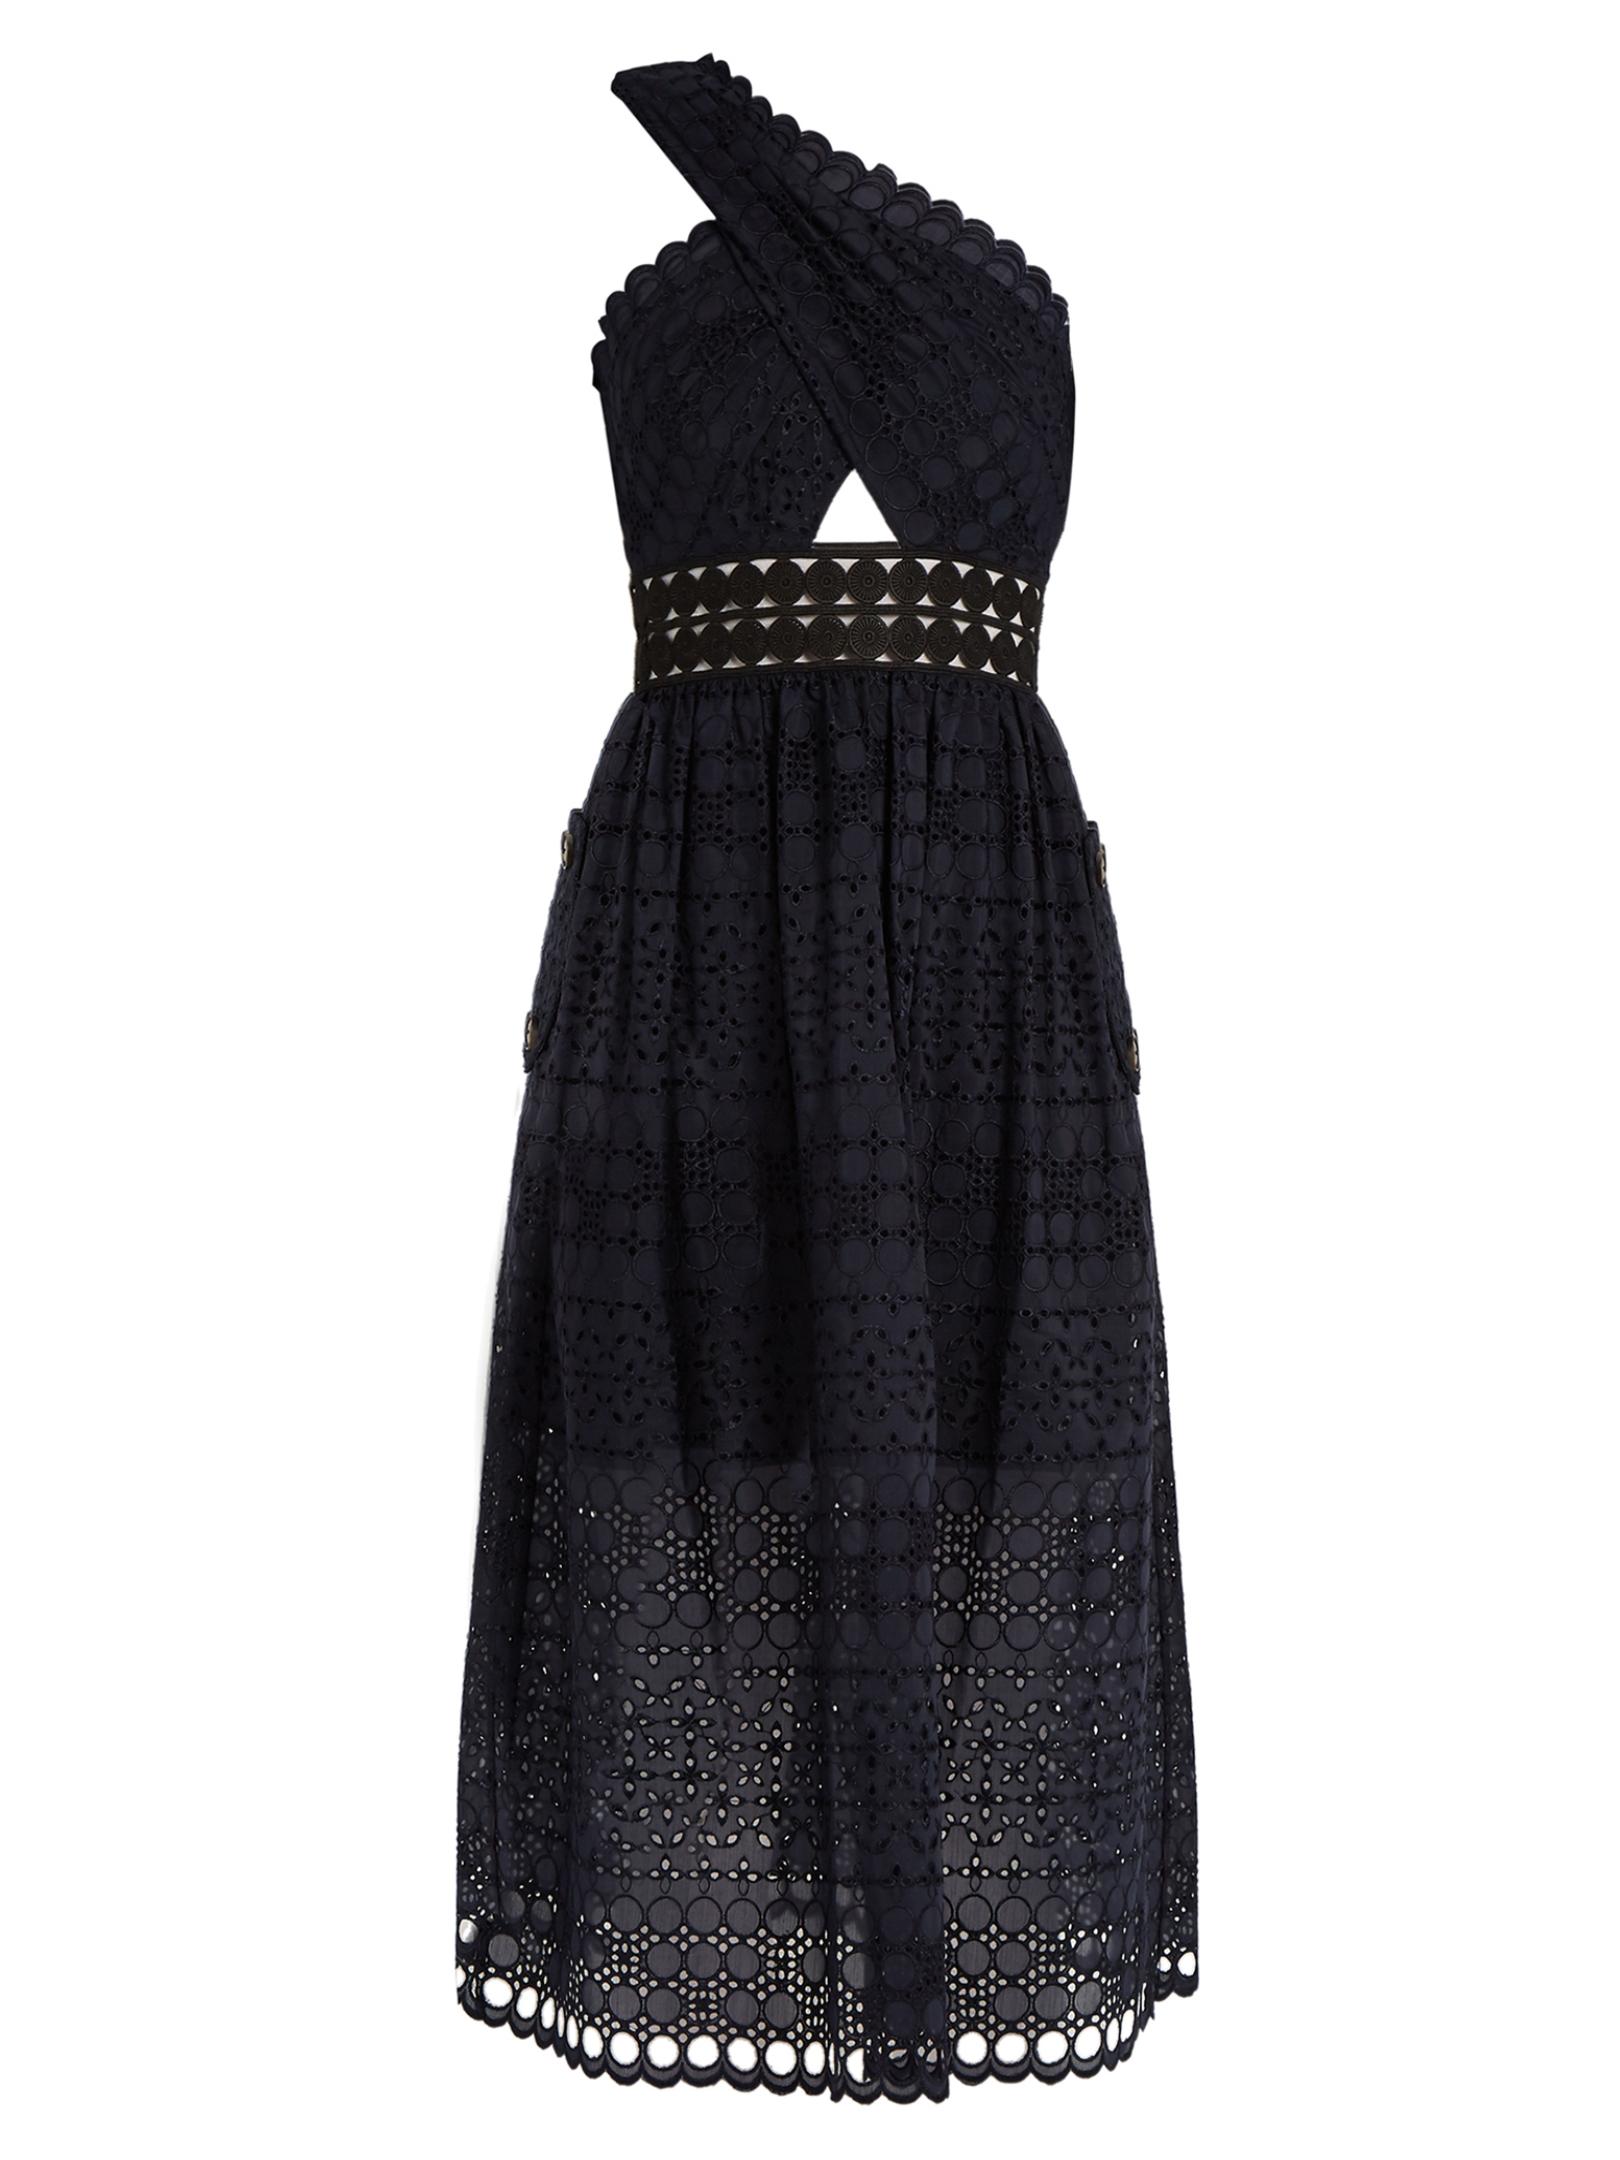 Self Portrait One Shoulder Guipure Lace Midi Dress Black Fashion Style Fan